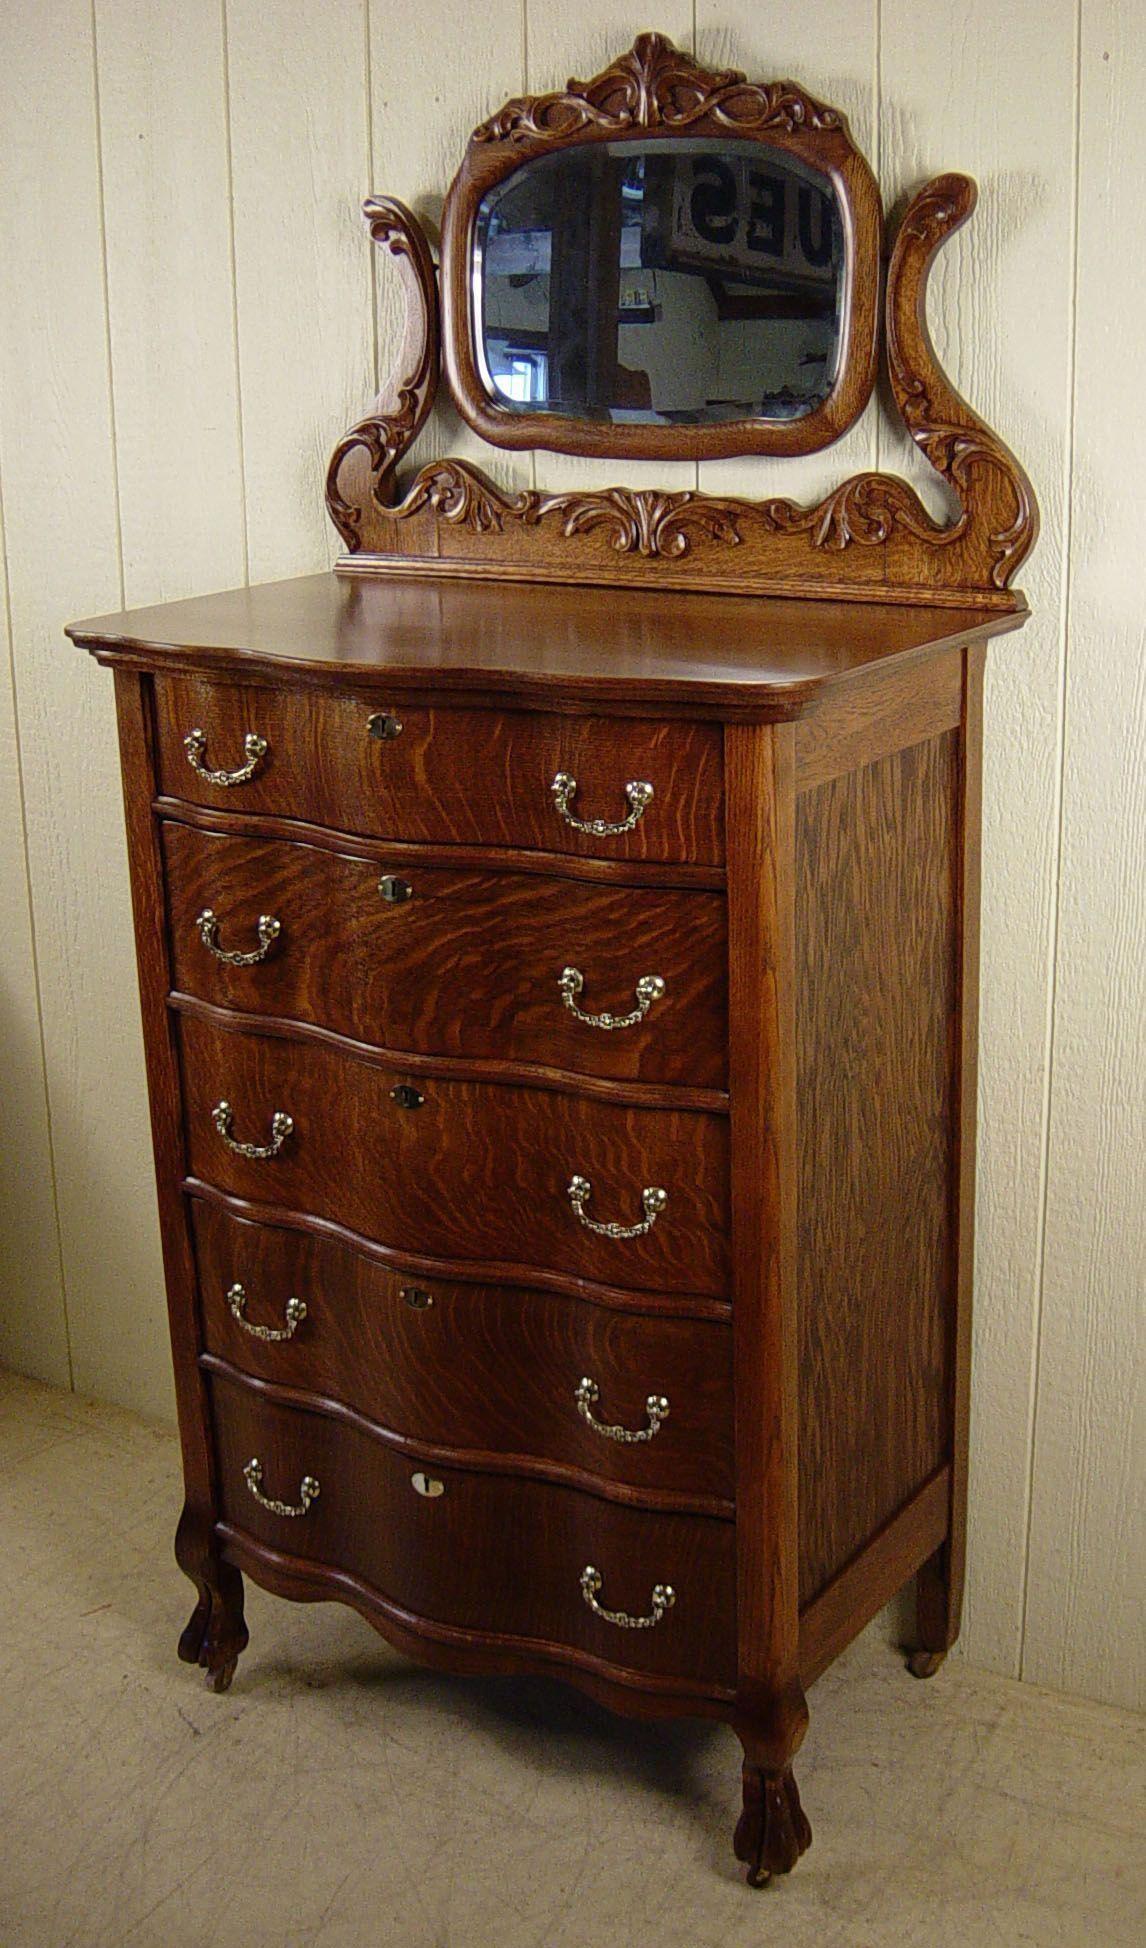 Oak Serpentine Chest with mirror bedroomfurnitureoak